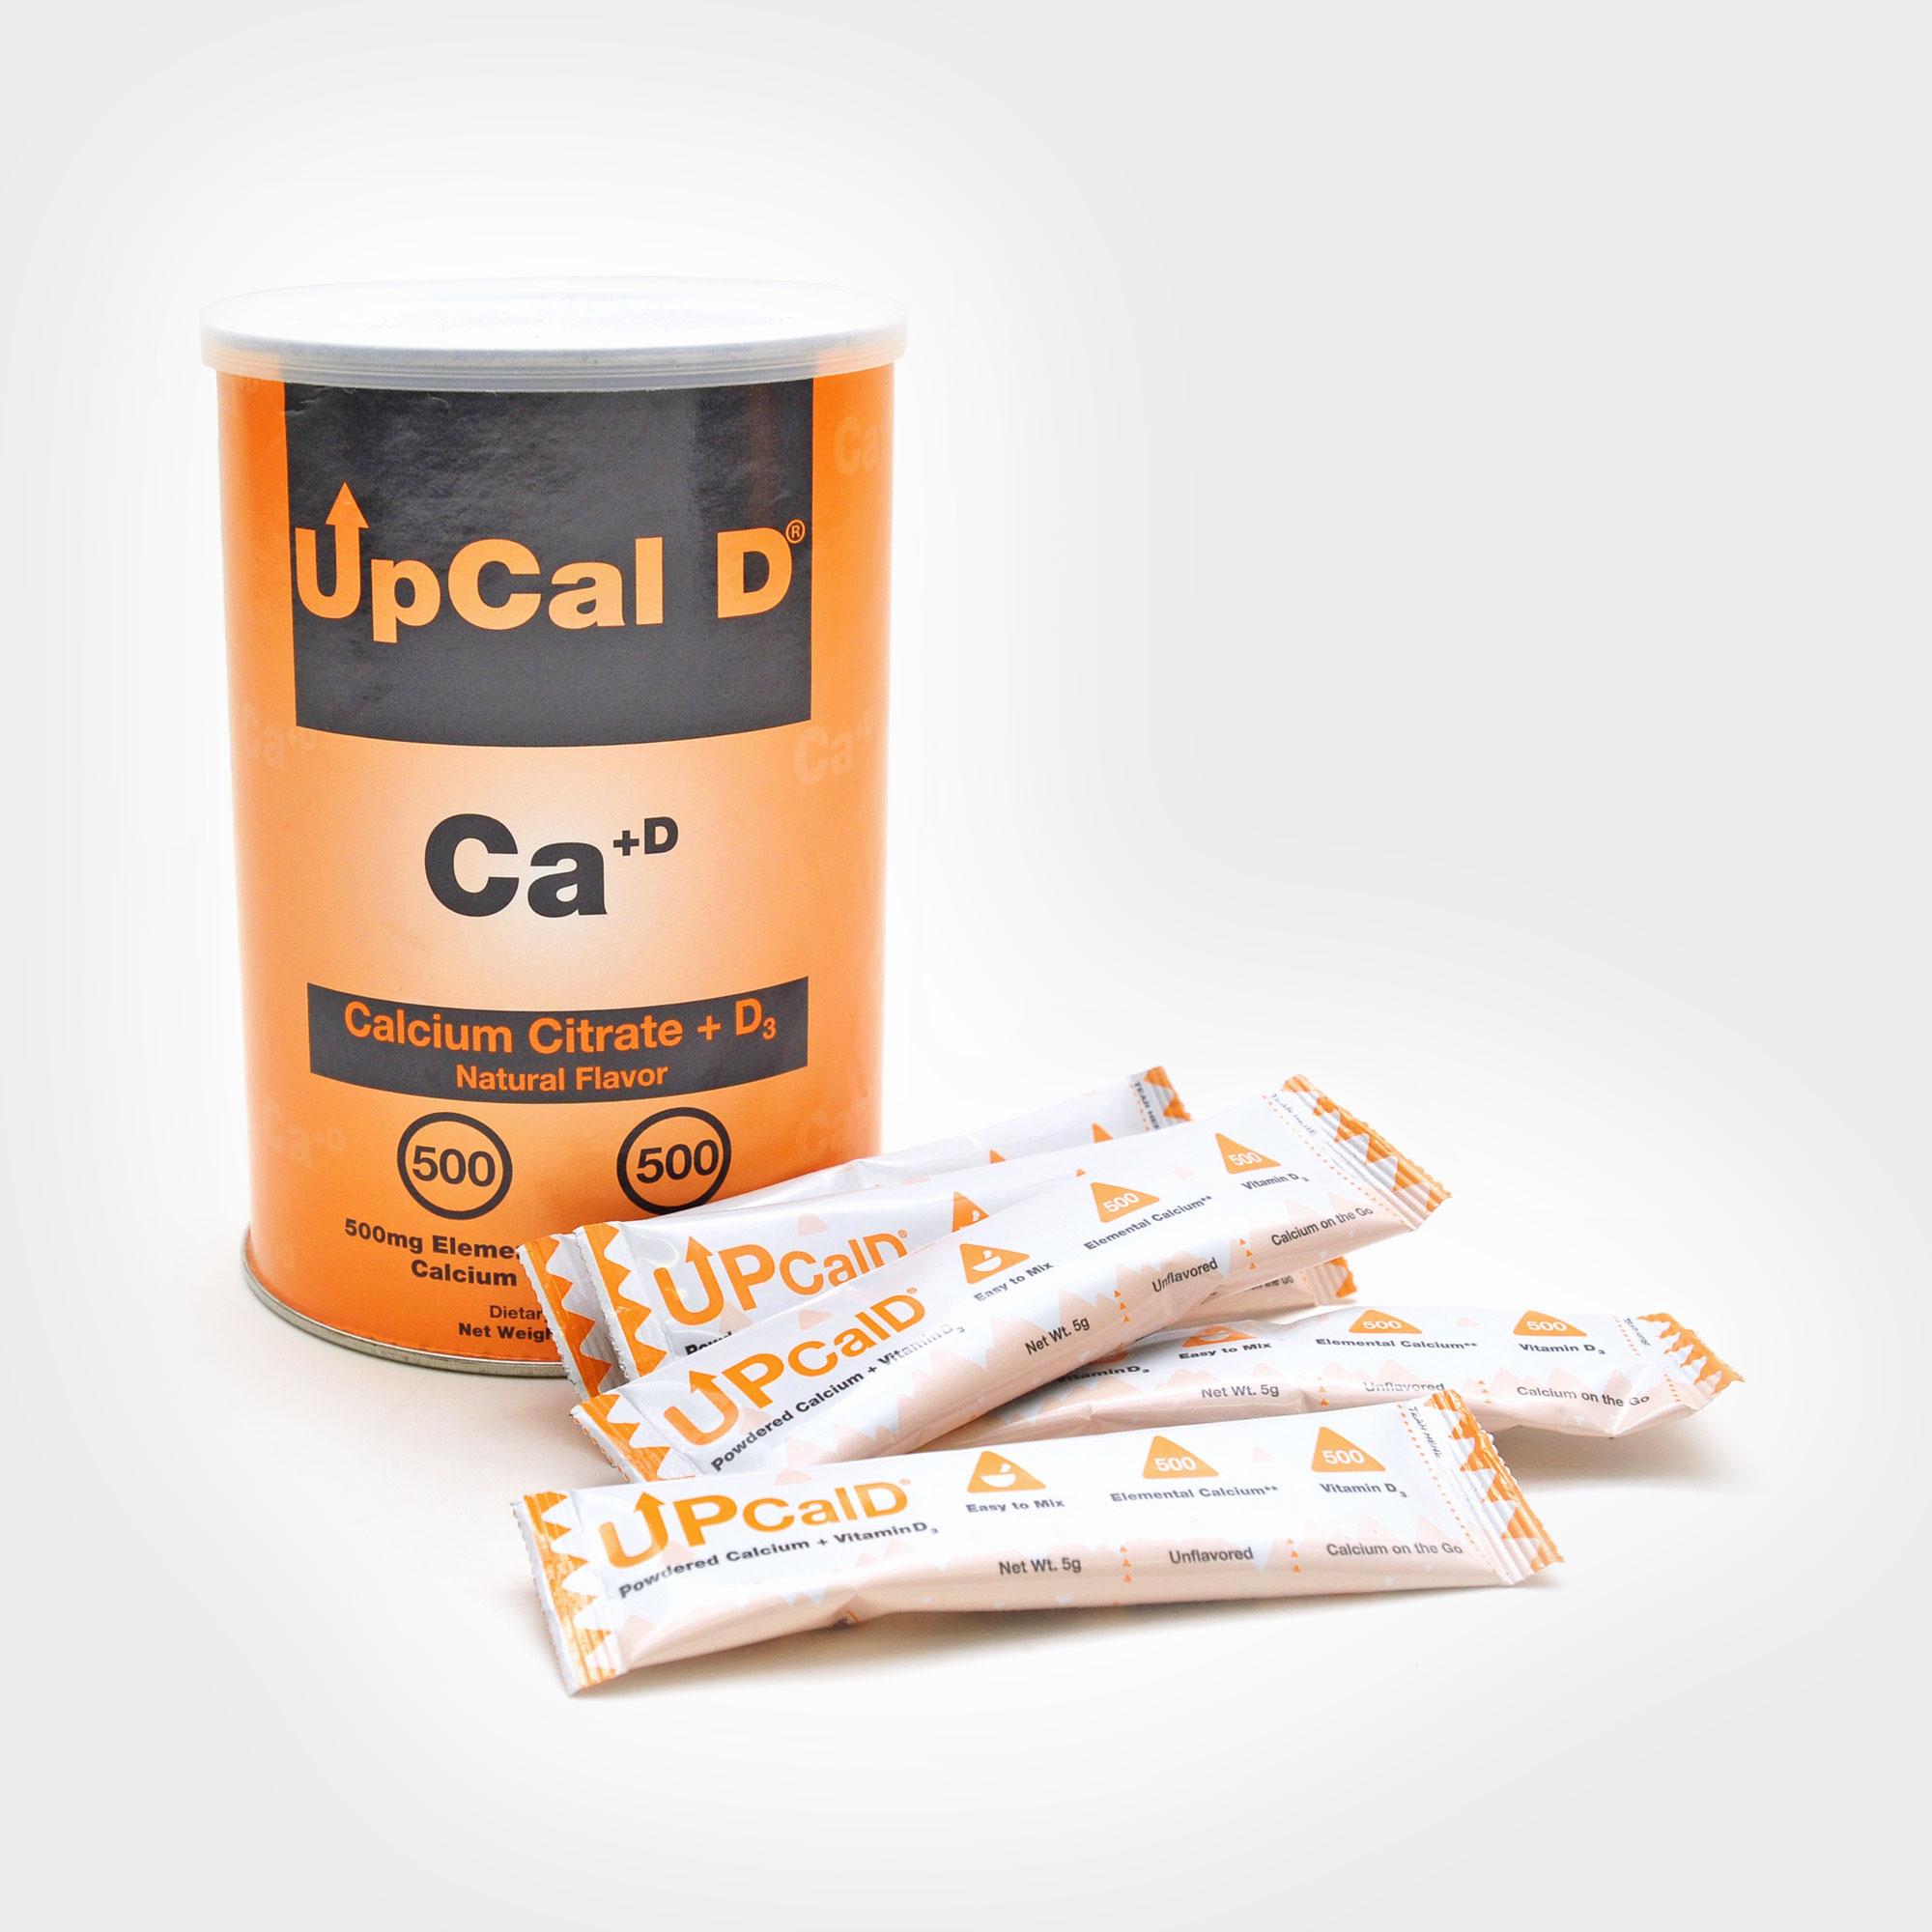 Upcal D